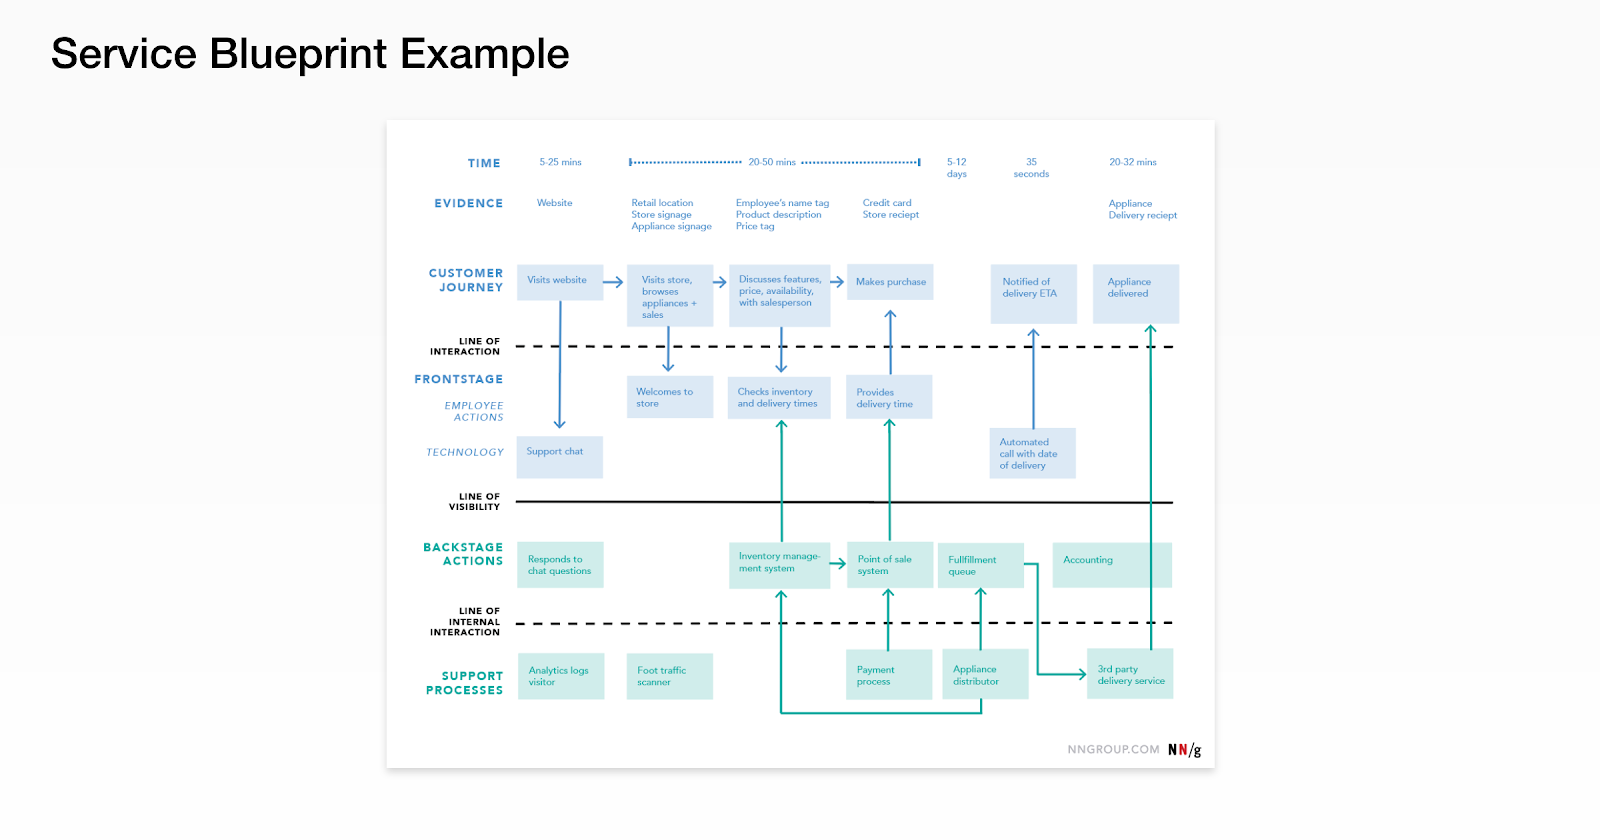 A service blueprint example.